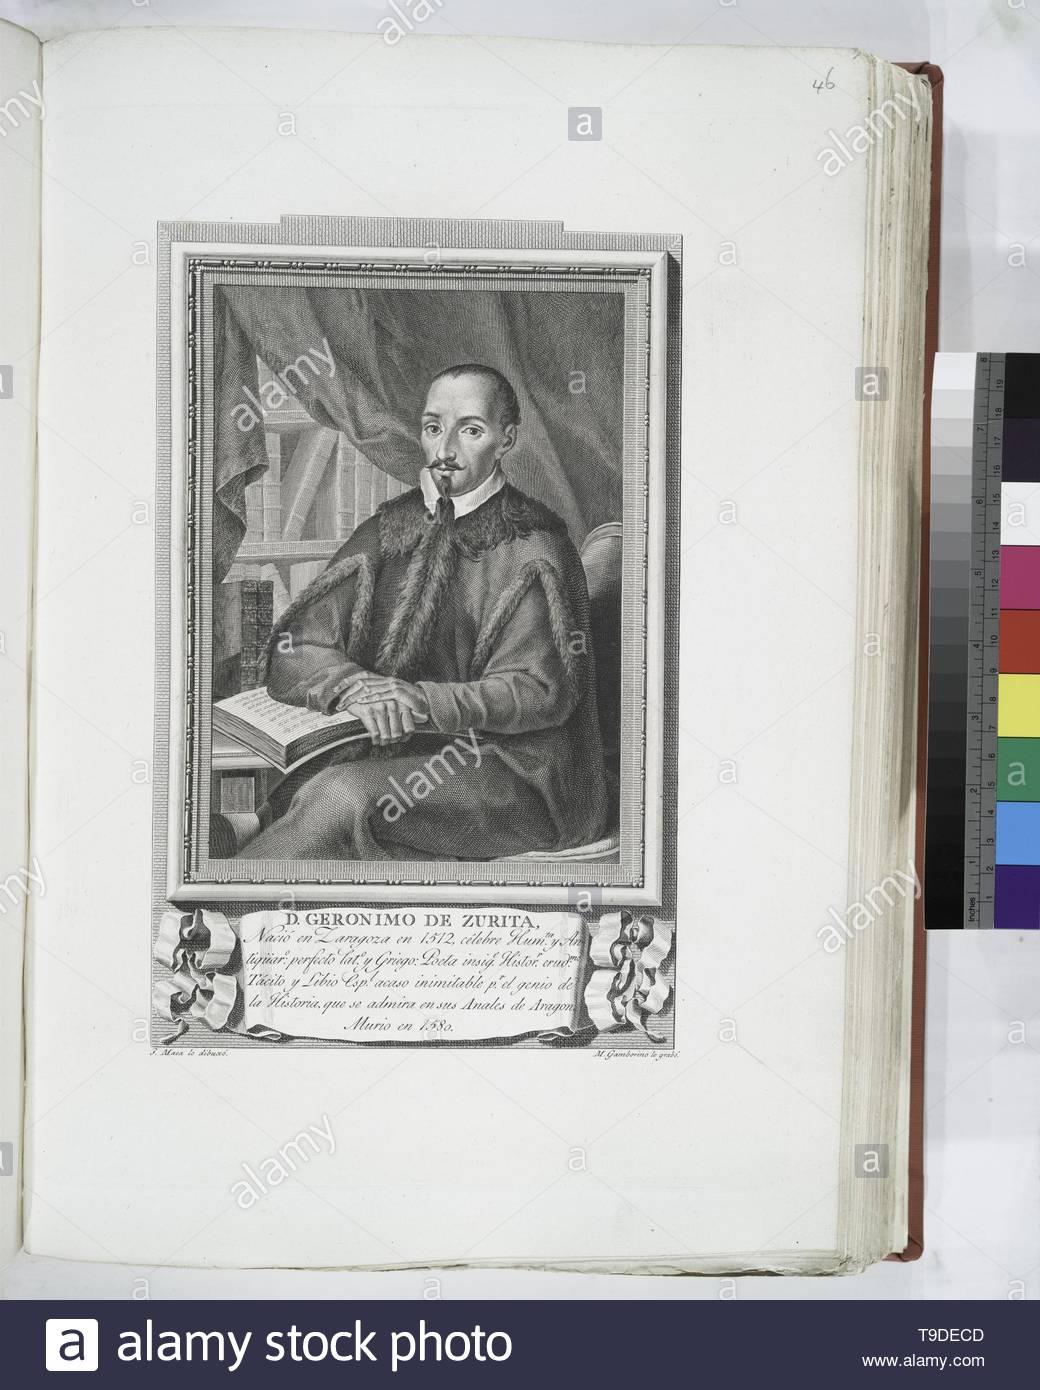 Maea,José(1759-1826)-D  Geronimo de Zurita - Stock Image